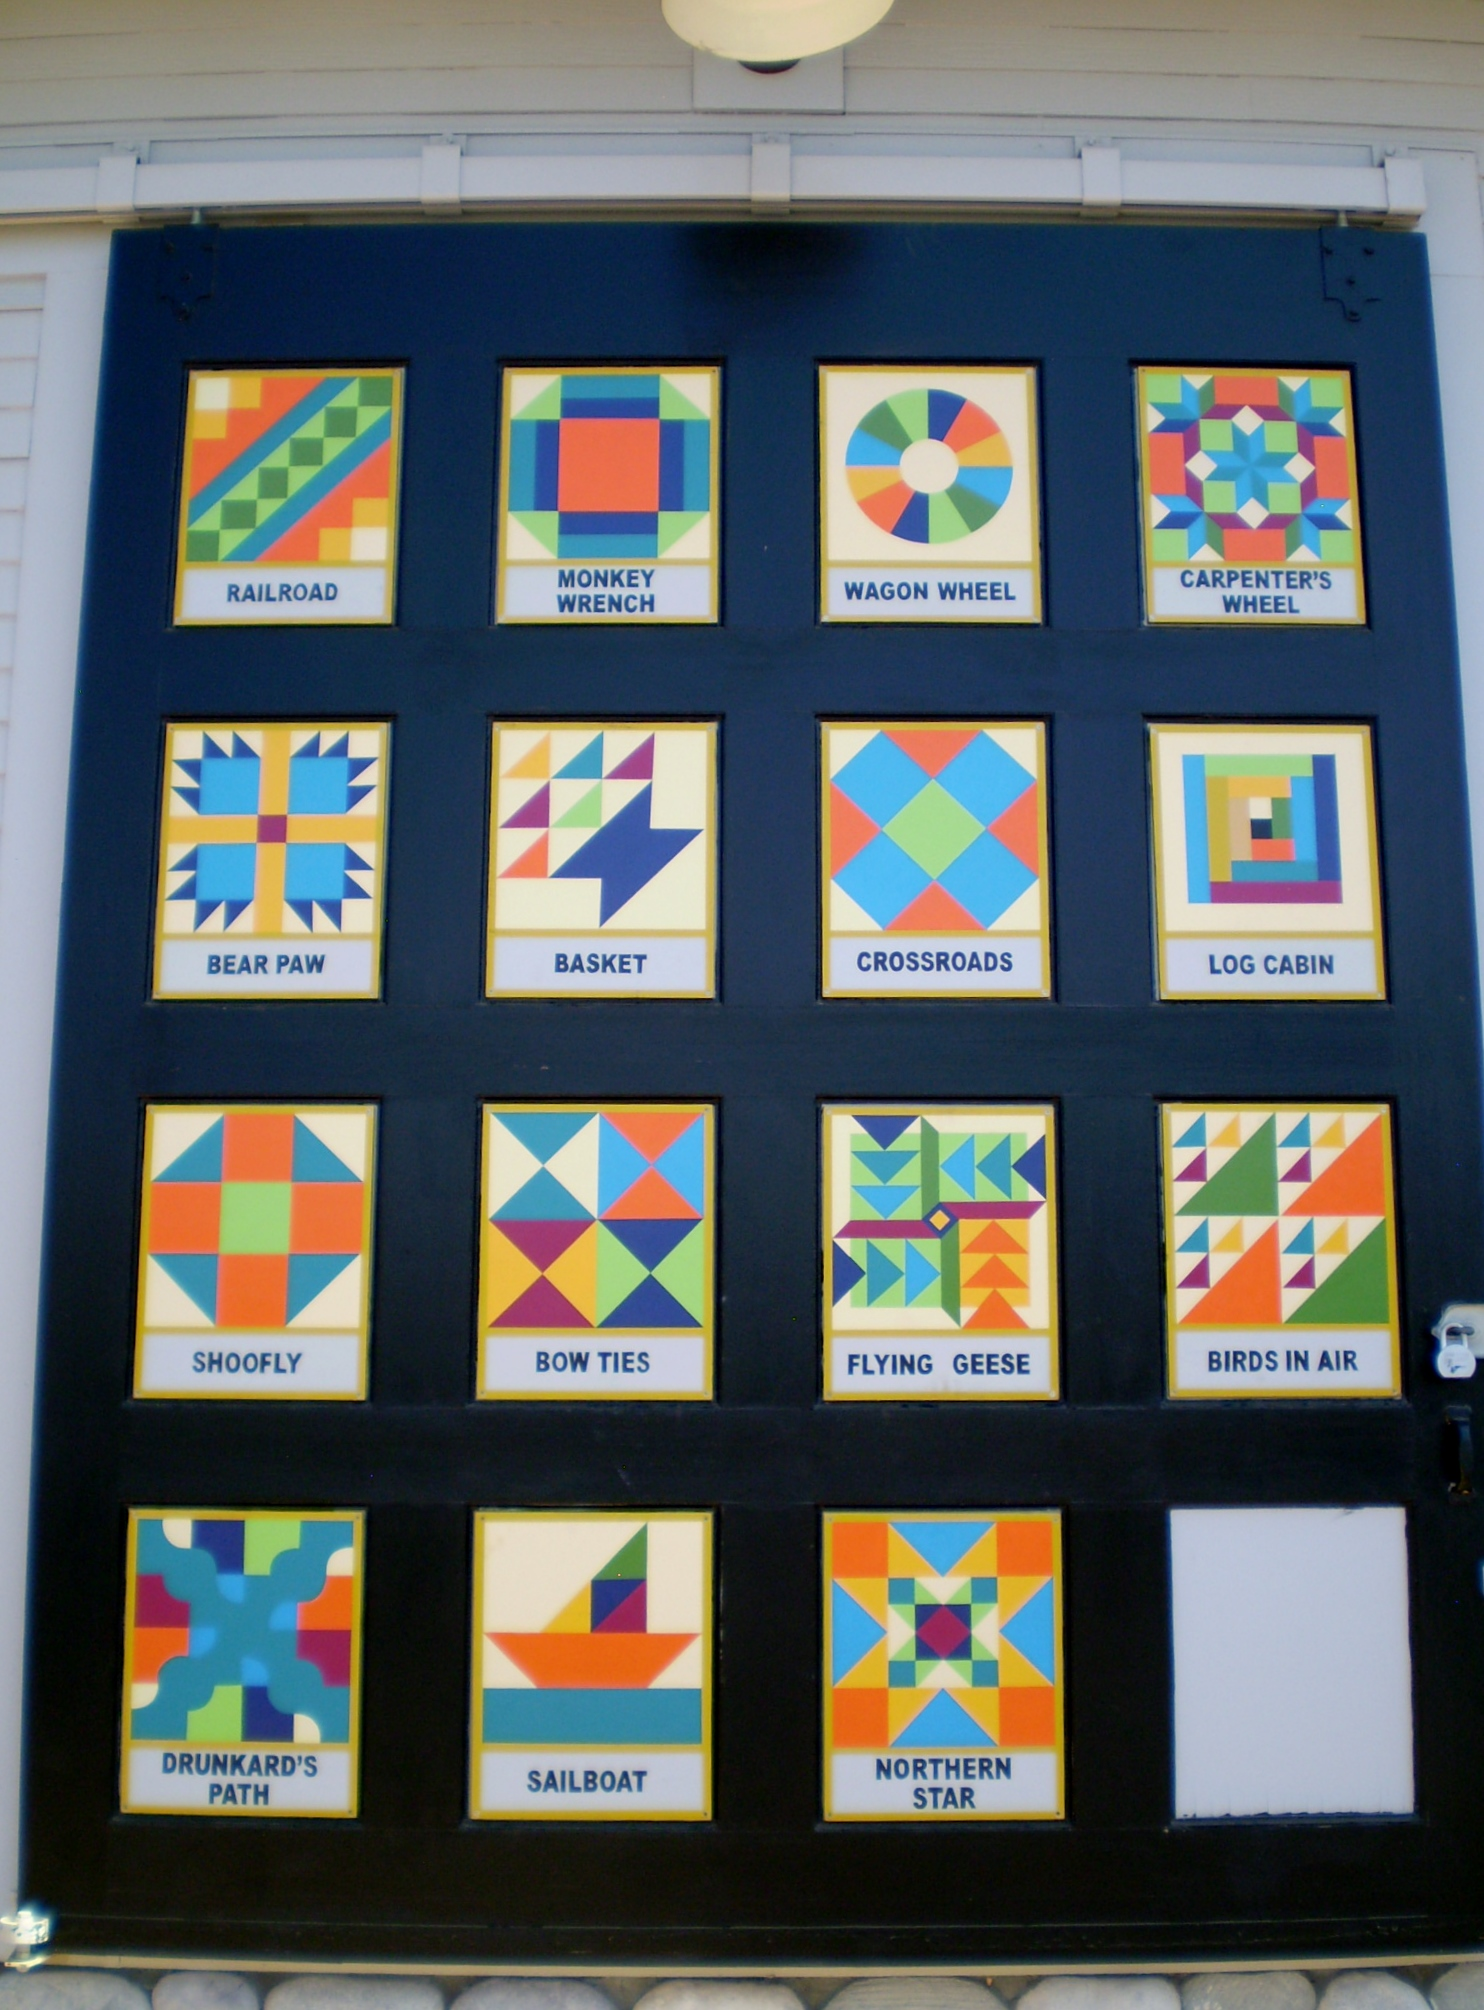 Rio Linda Depot helps tell the story of America's Underground ... : railroad quilt block - Adamdwight.com